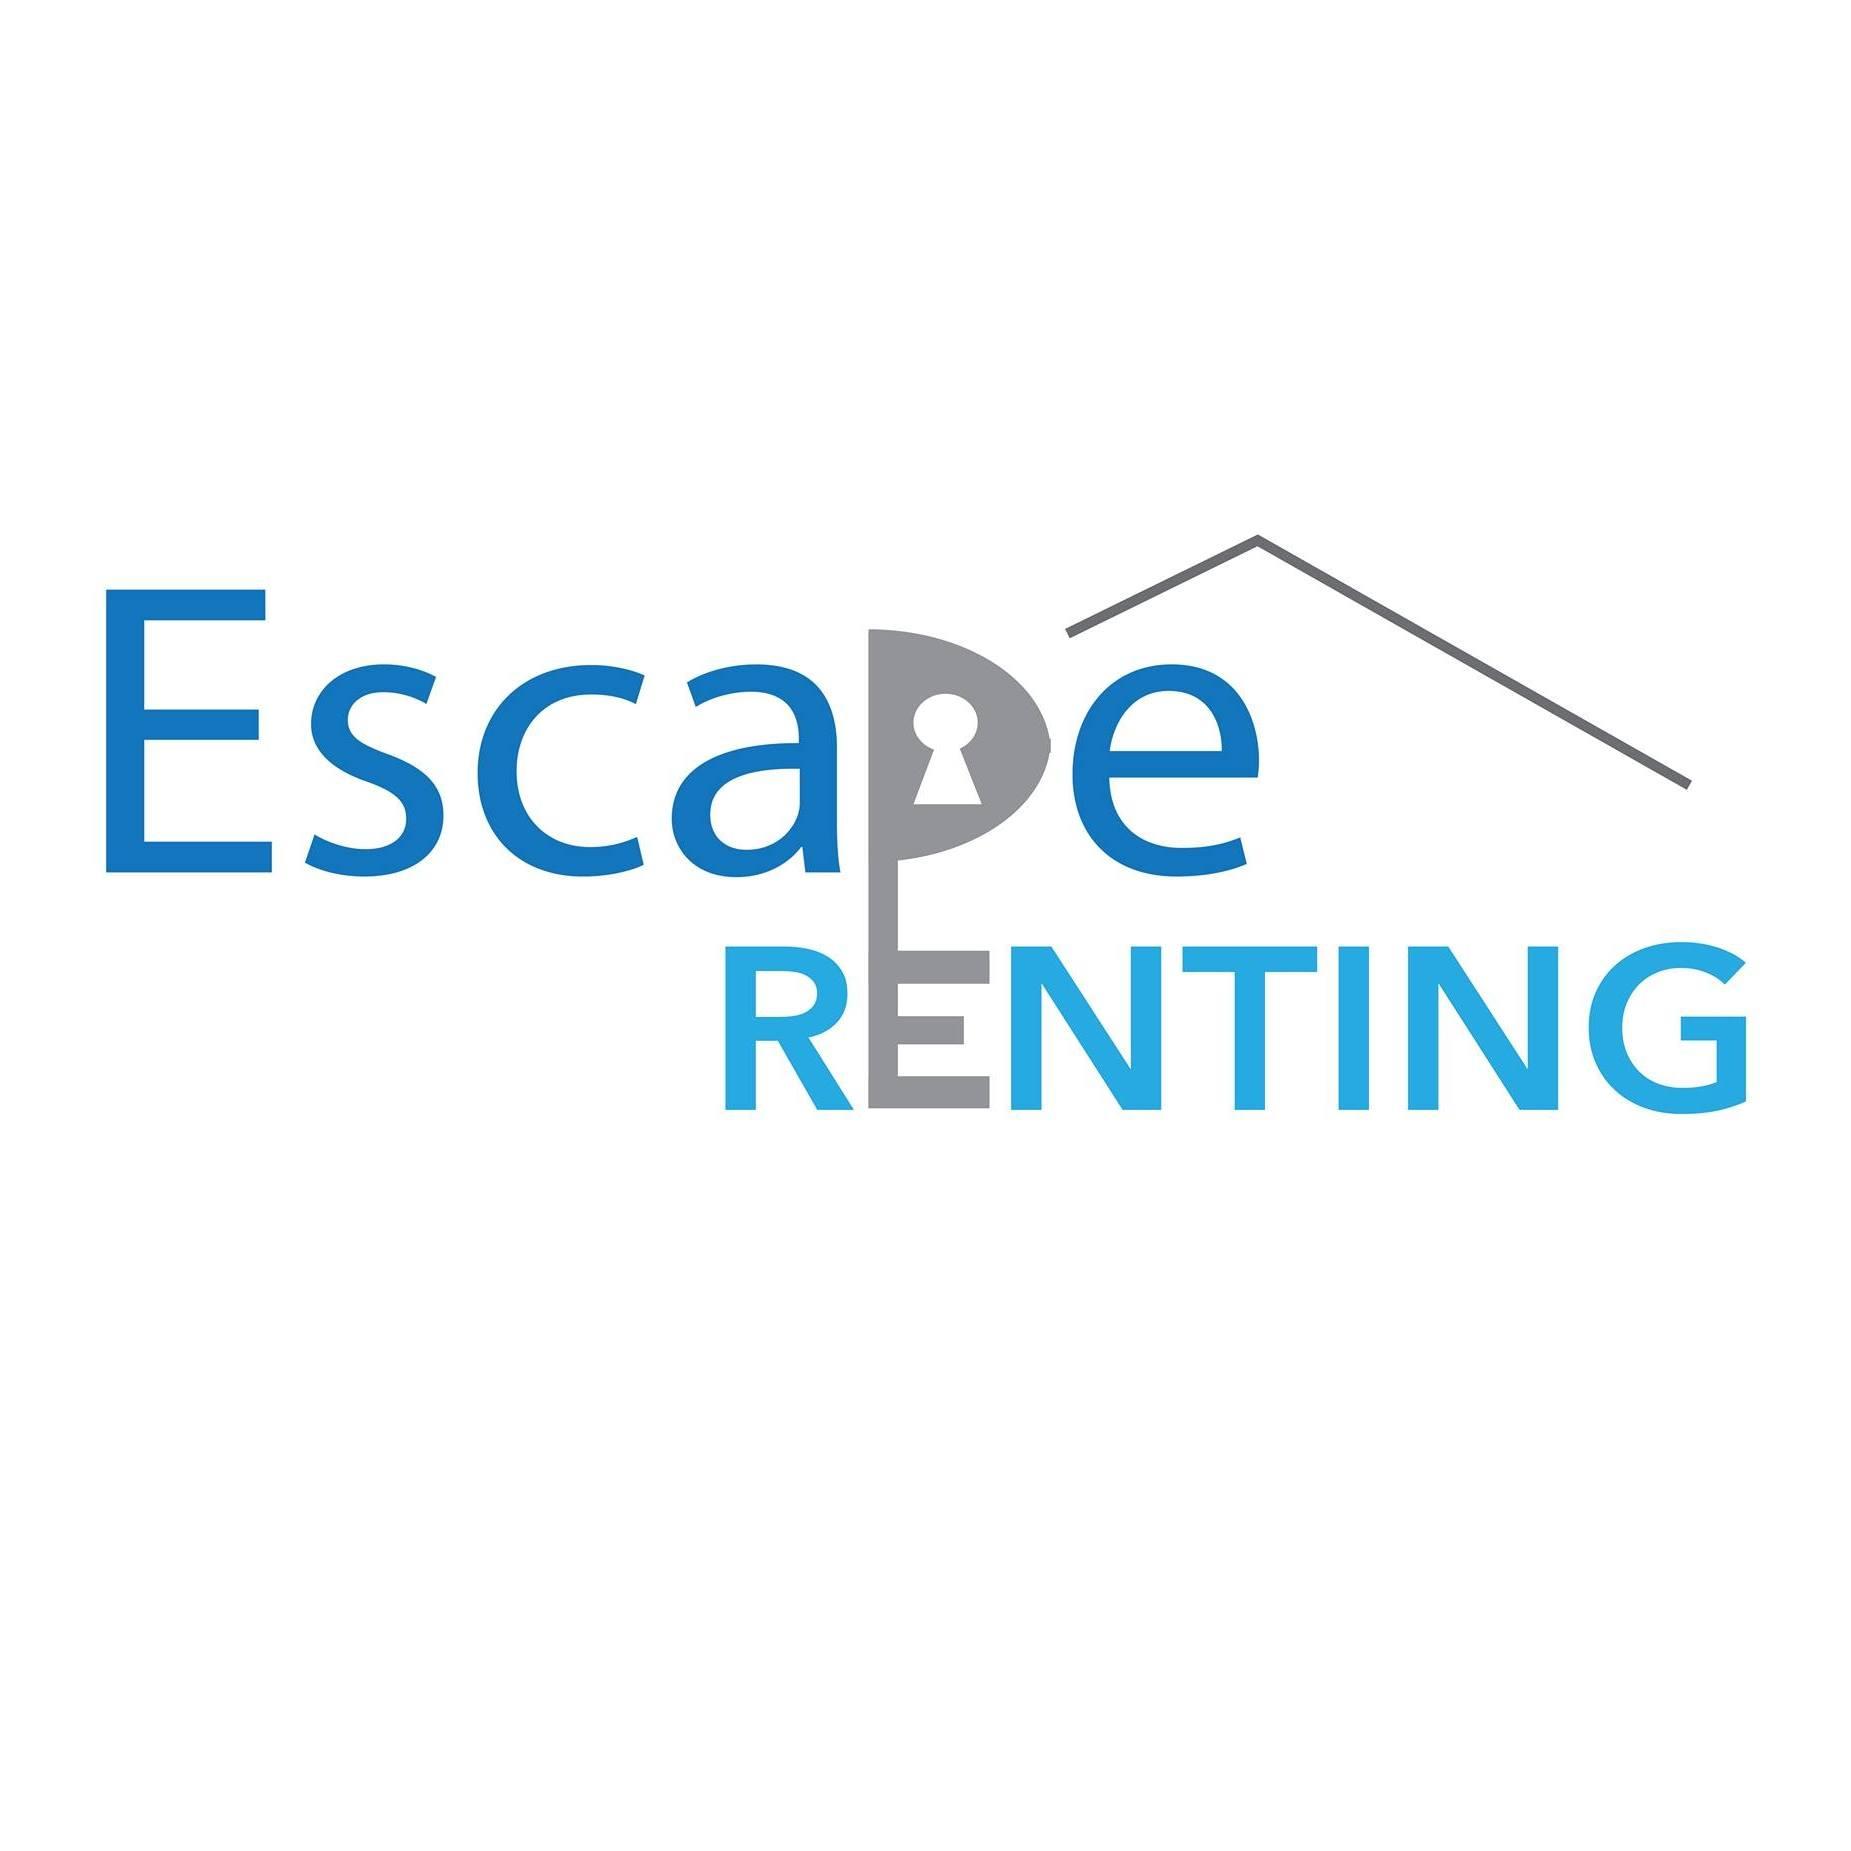 Escape Renting